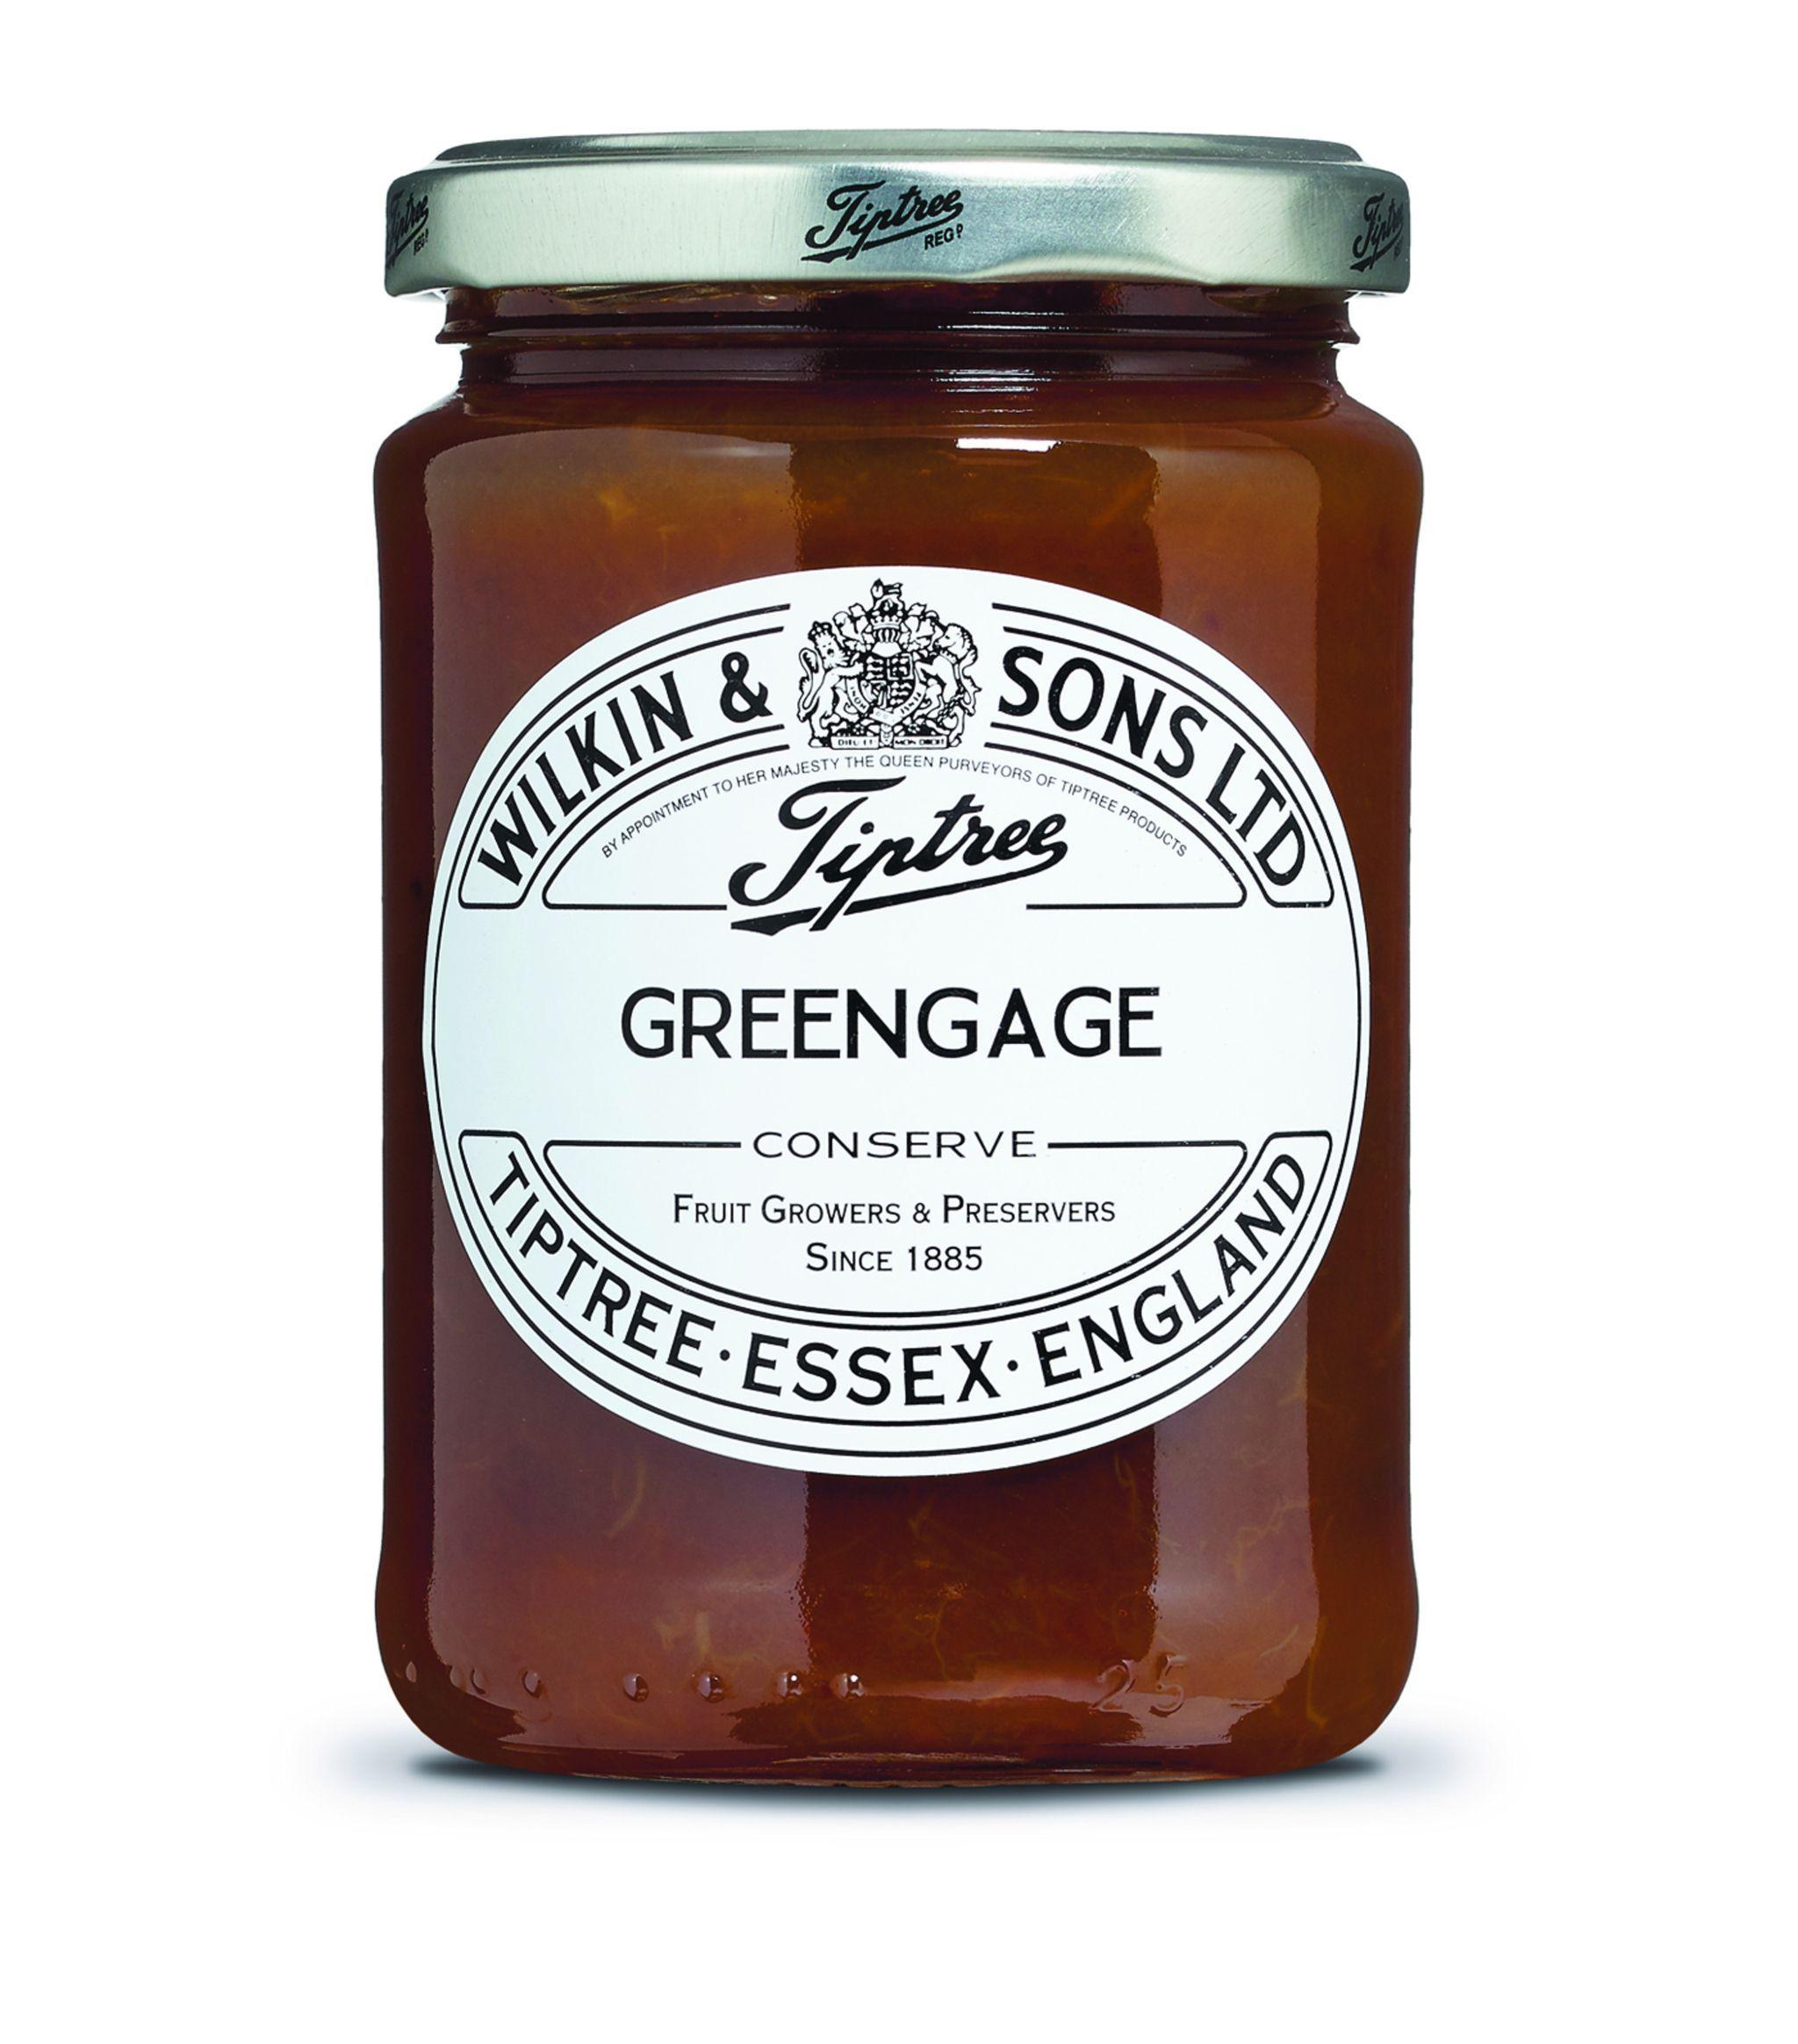 Tiptree no colour Greenage Conserve (340g) #AD , #SPONSORED, #colour, #Tiptree, #Greenage, #Conserve